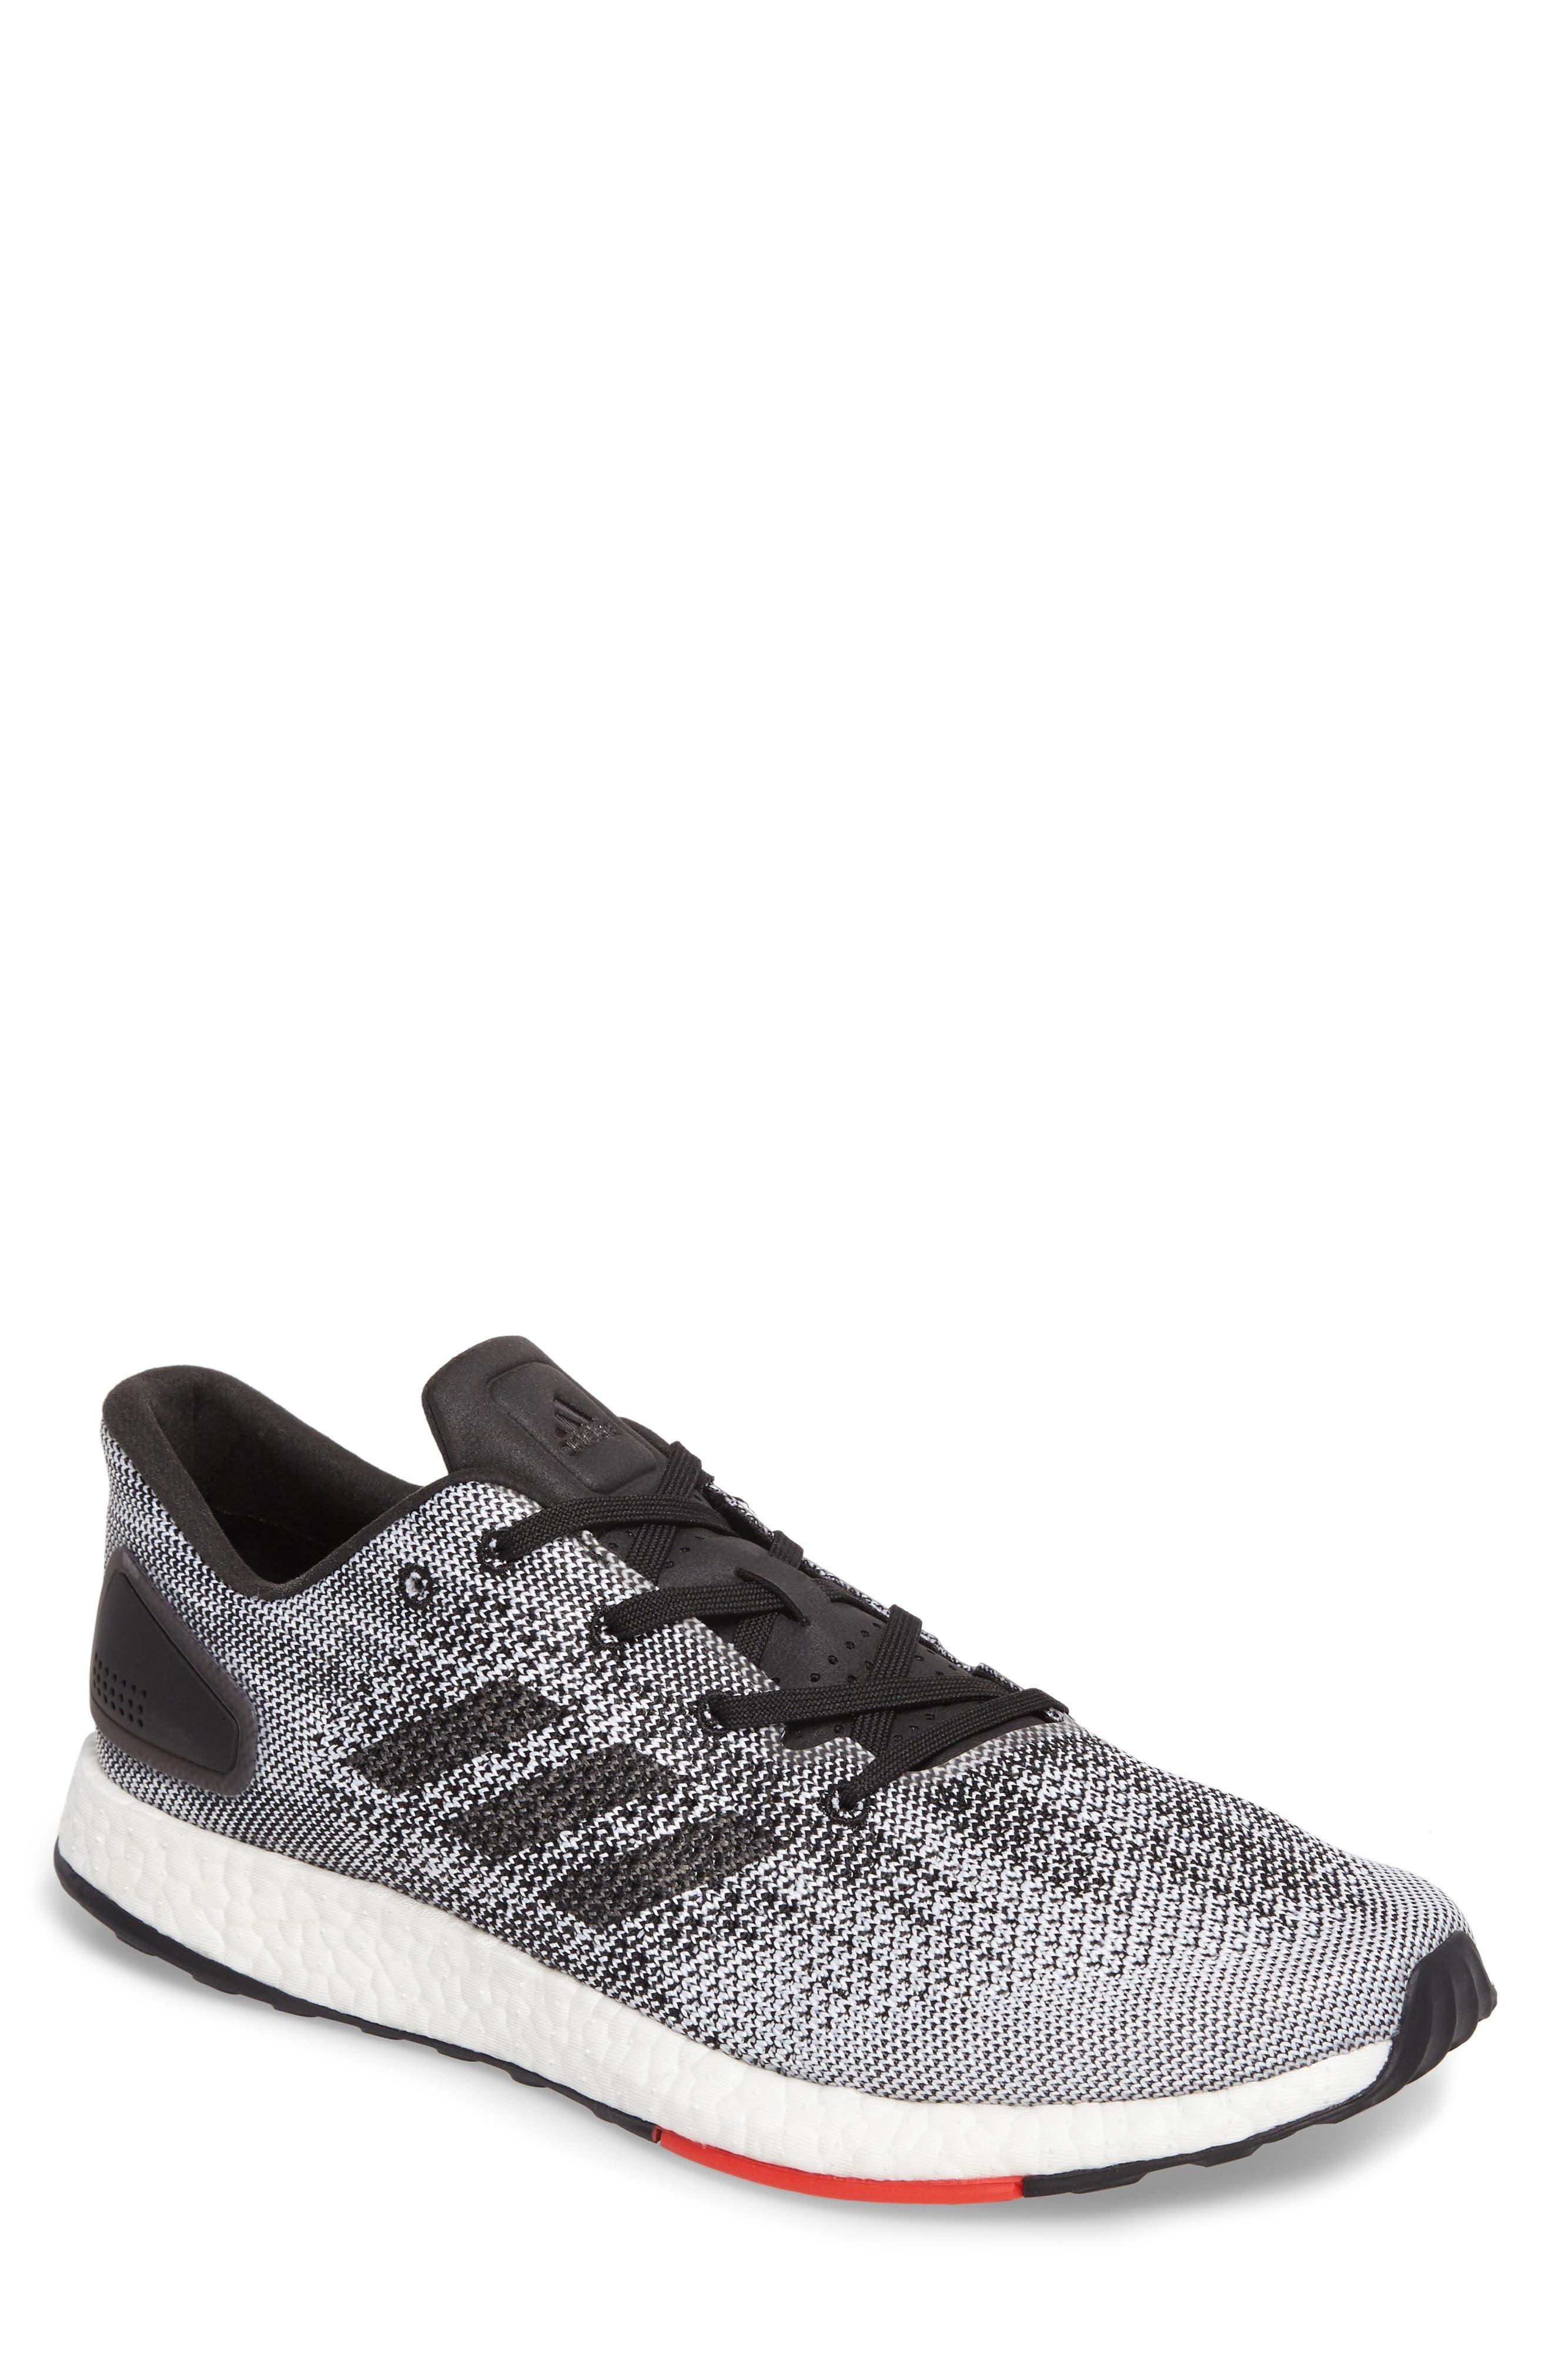 PureBoost DPR Running Shoe,                             Main thumbnail 1, color,                             Core Black/White